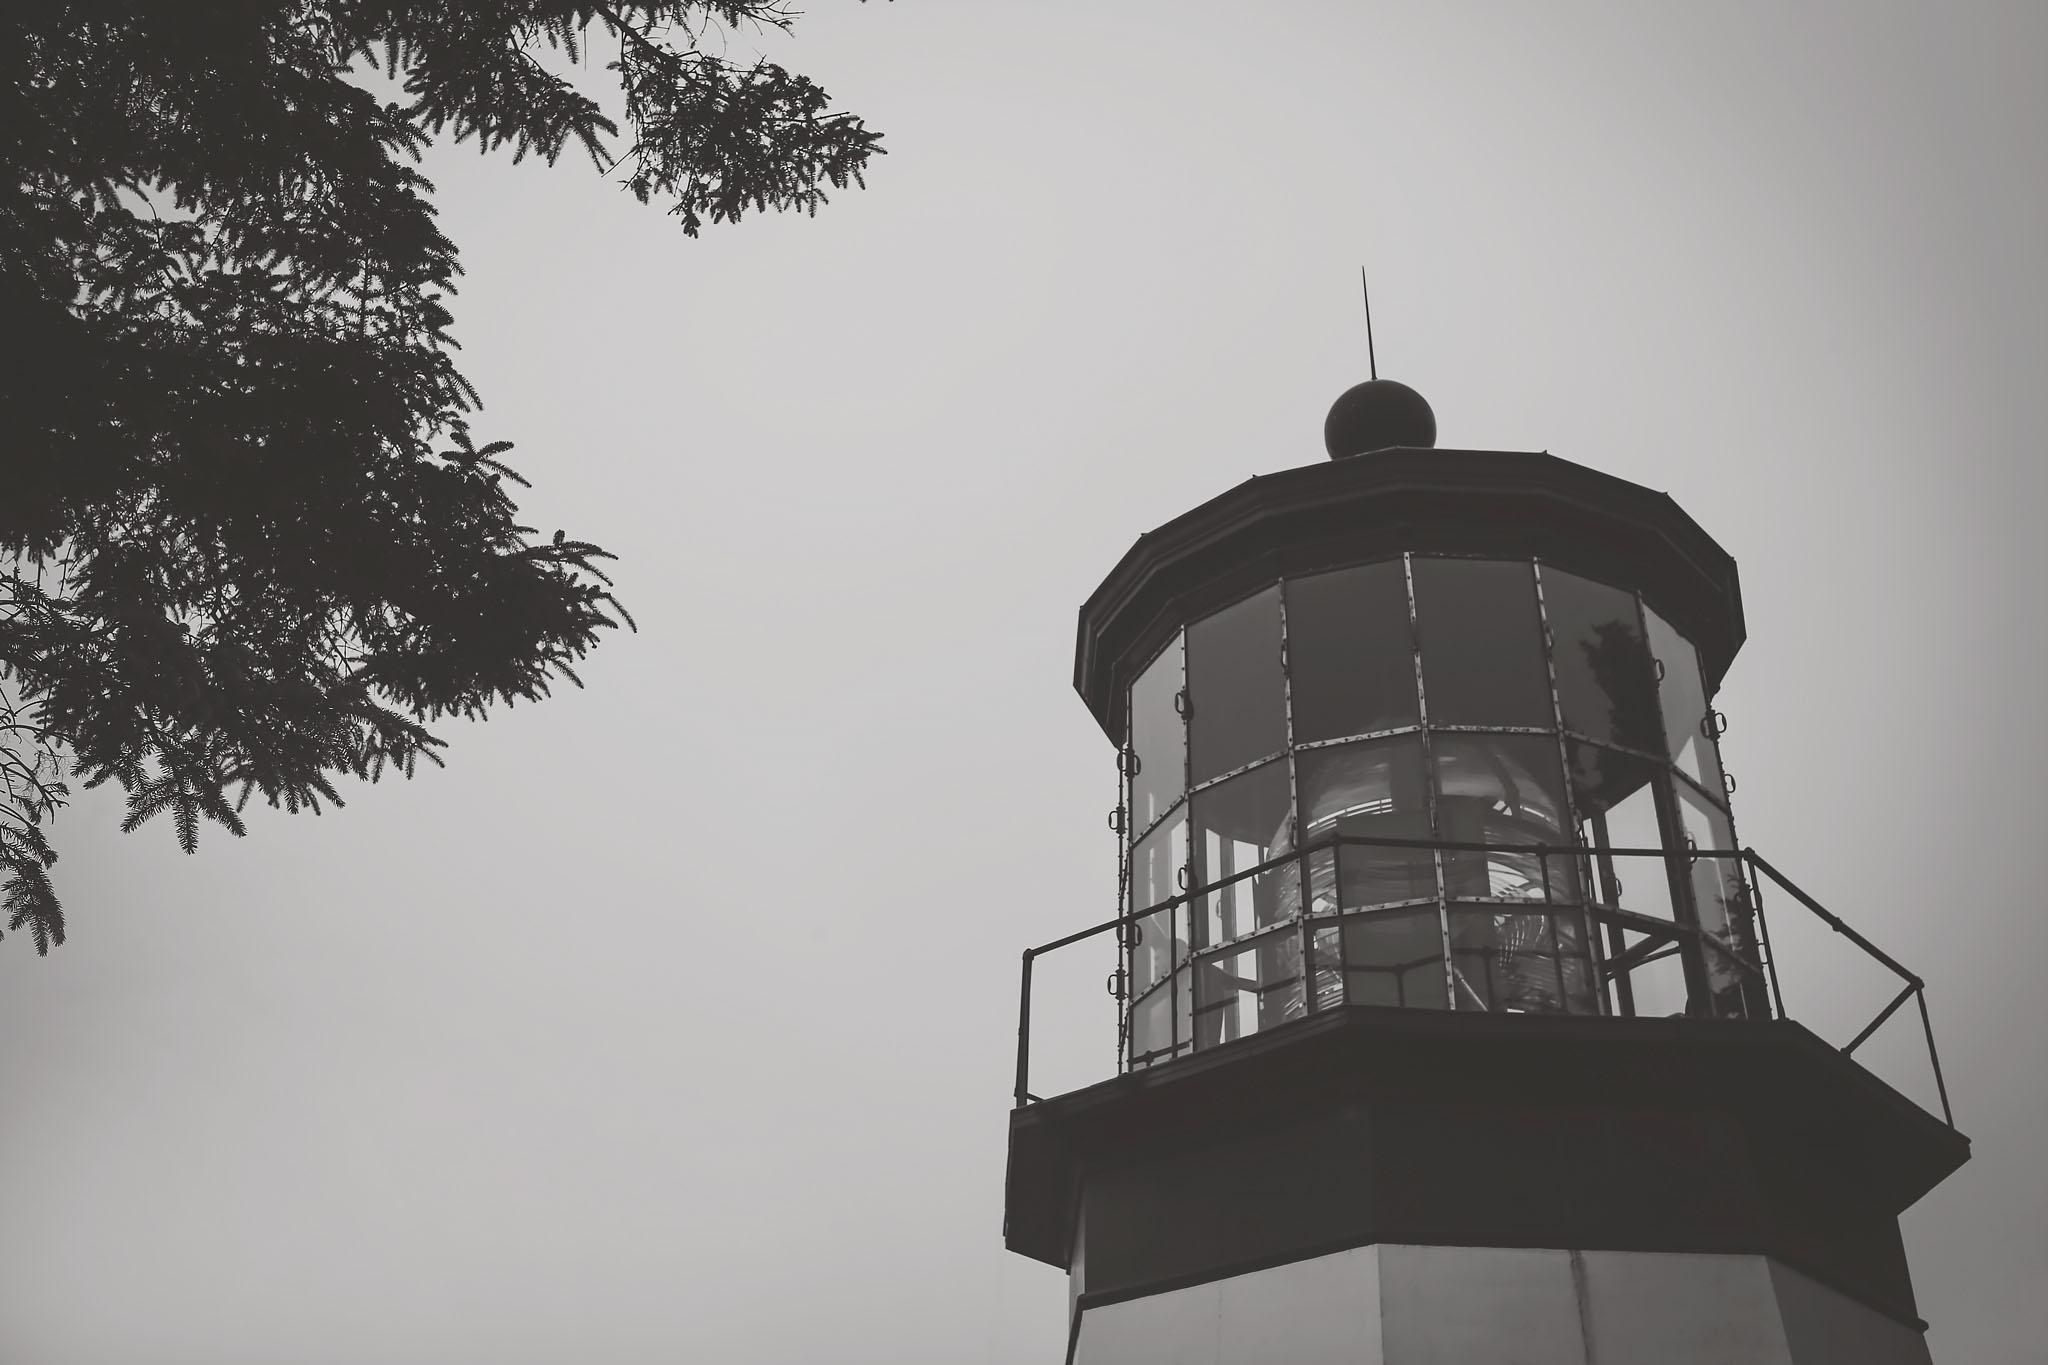 oregon coast, black and white series, jennifer picard photography, travel photography, lighthouse